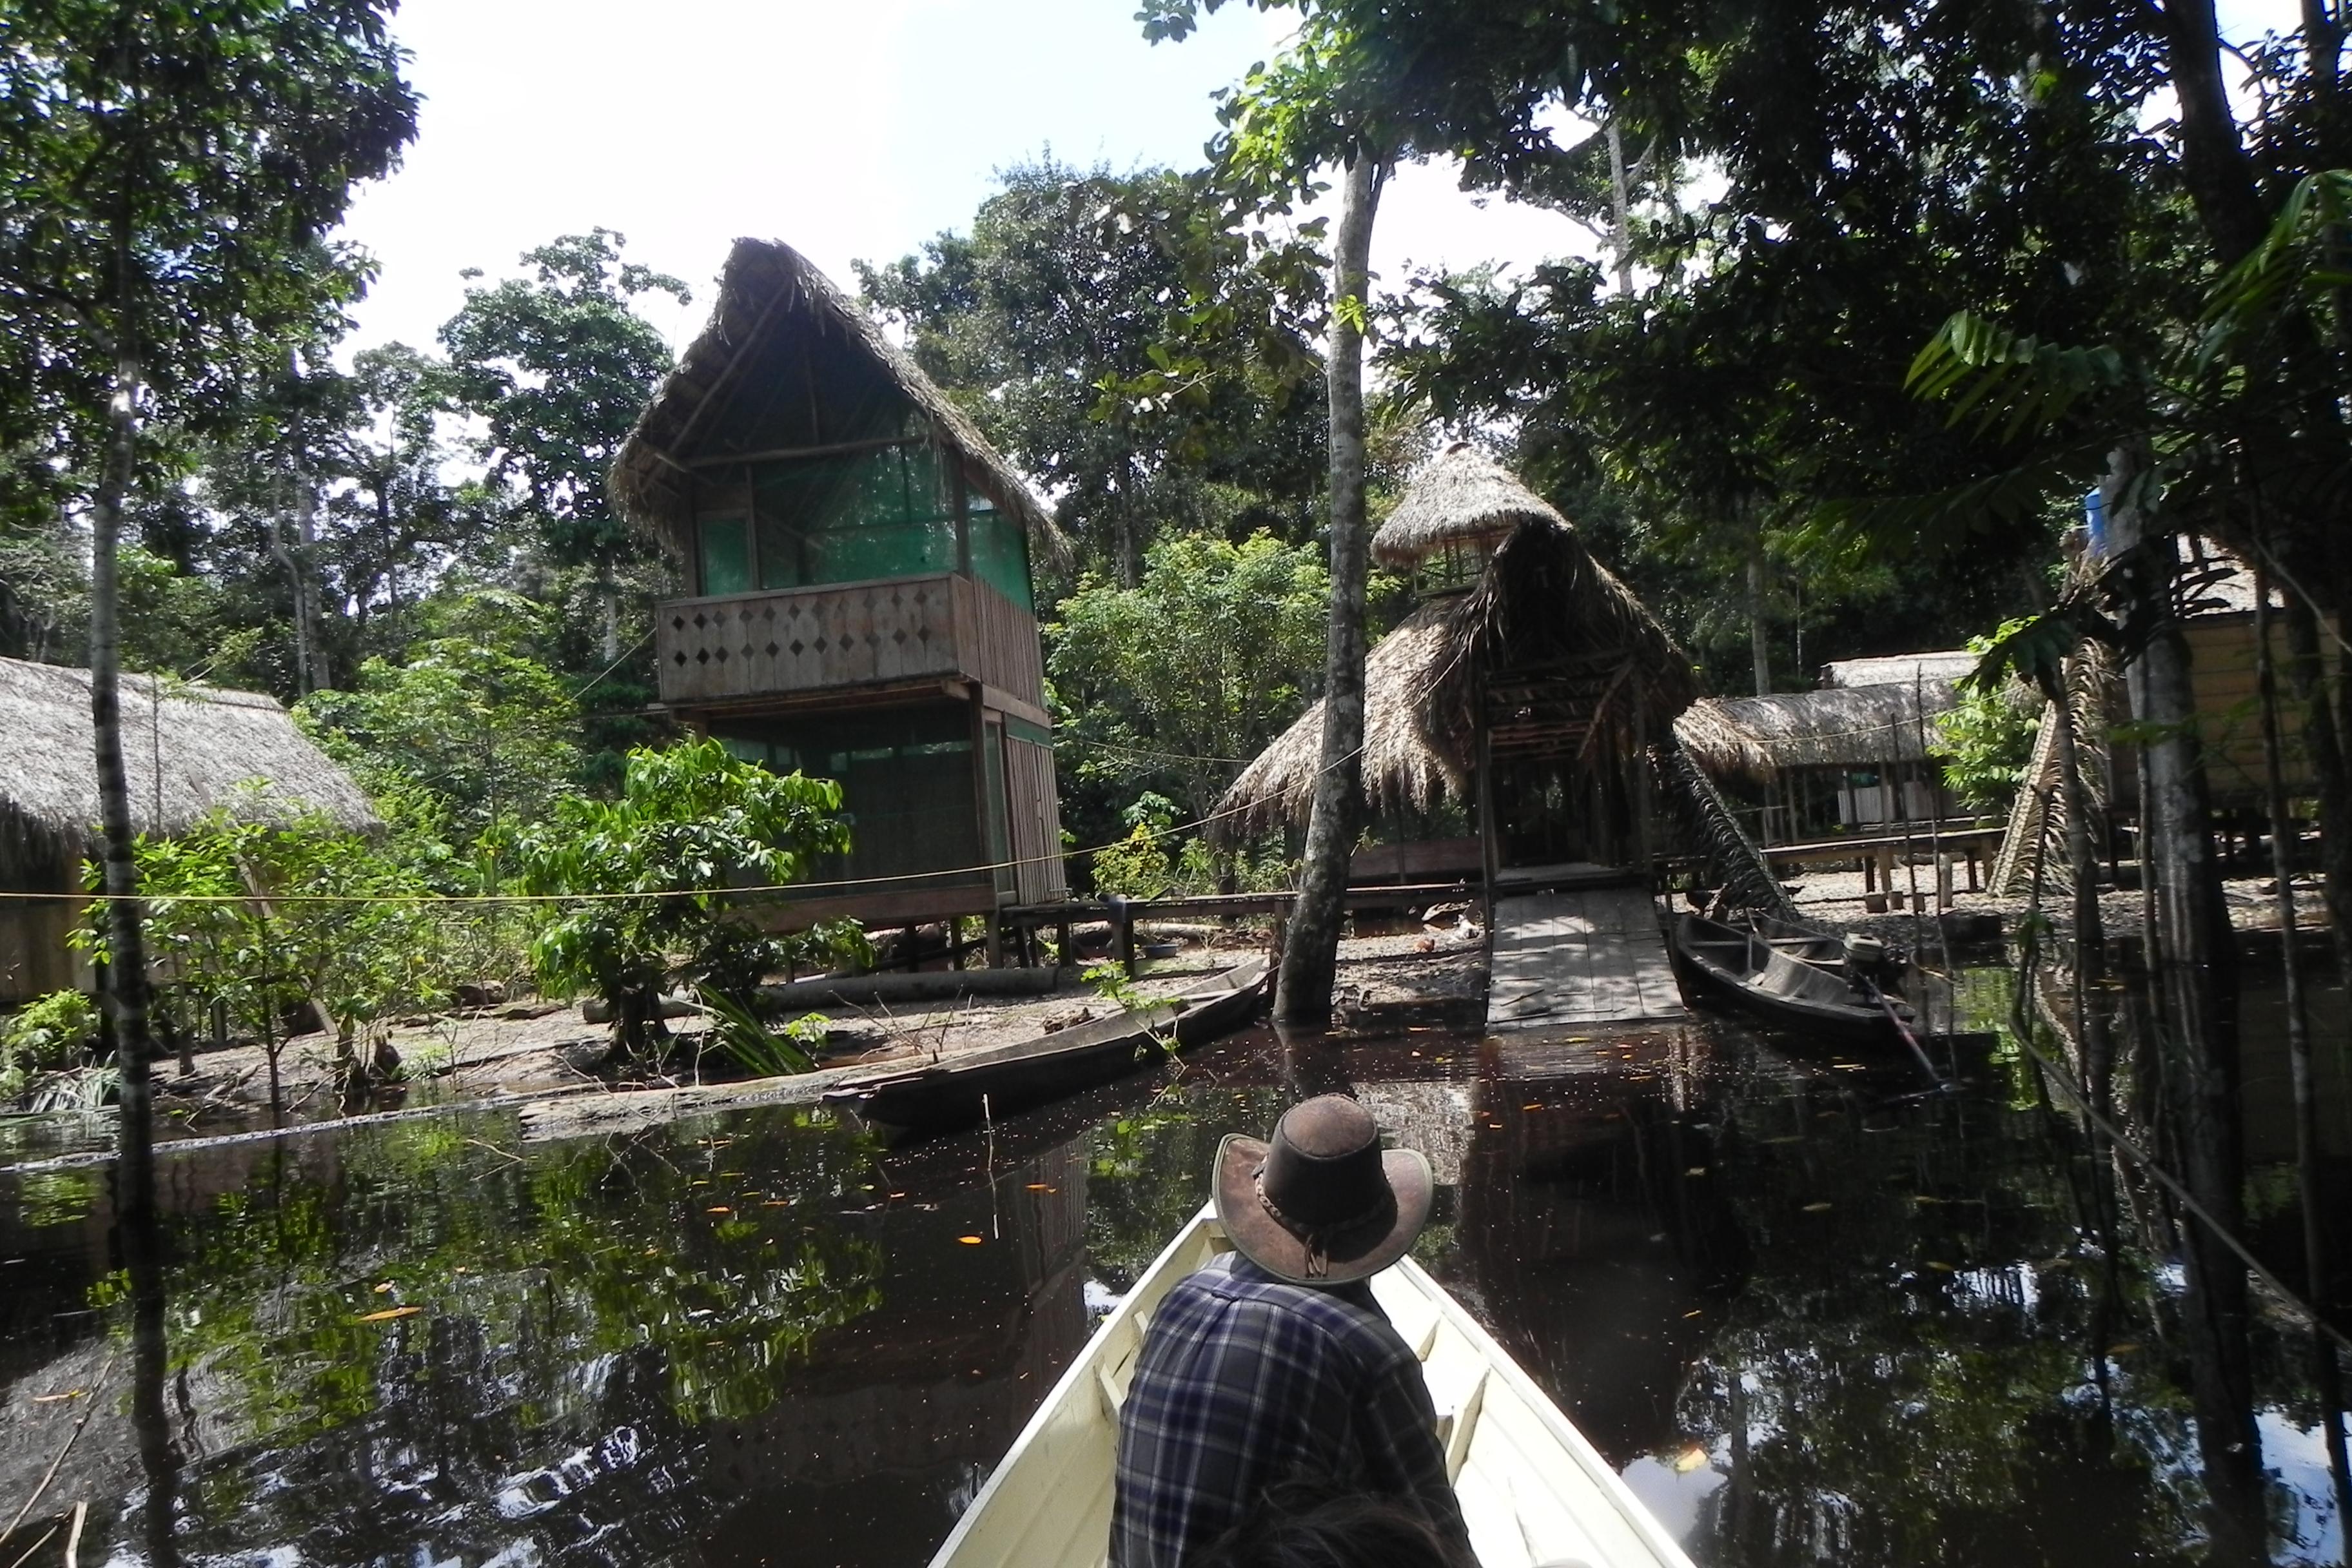 Explore the amazon jungle peru trip advisors - All Photos 182